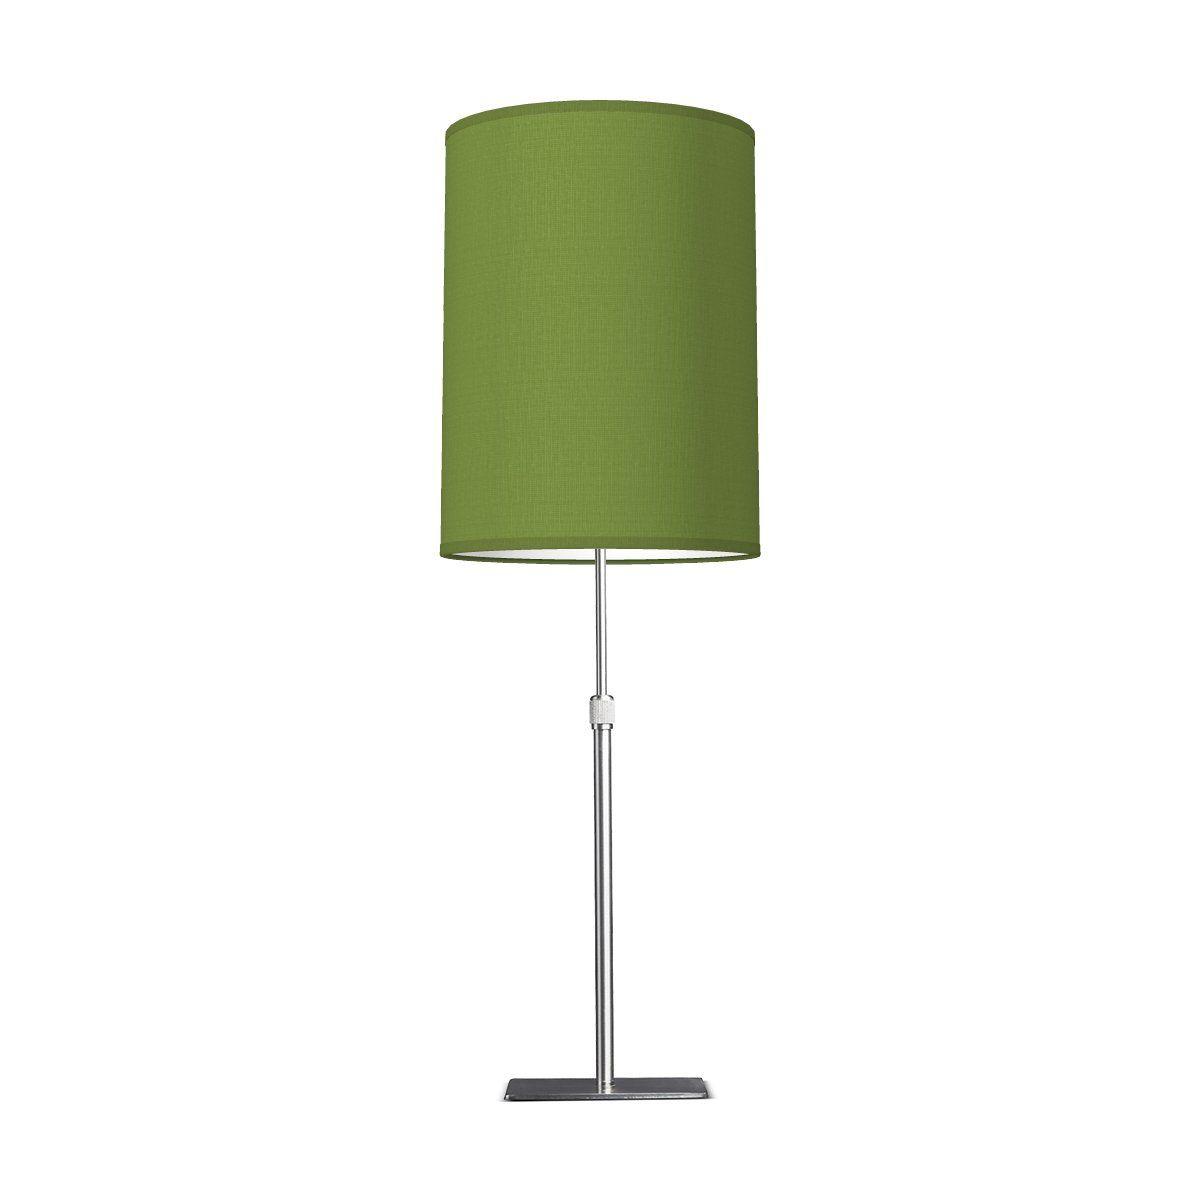 tafellamp bobo tube Ø 25 cm - groen